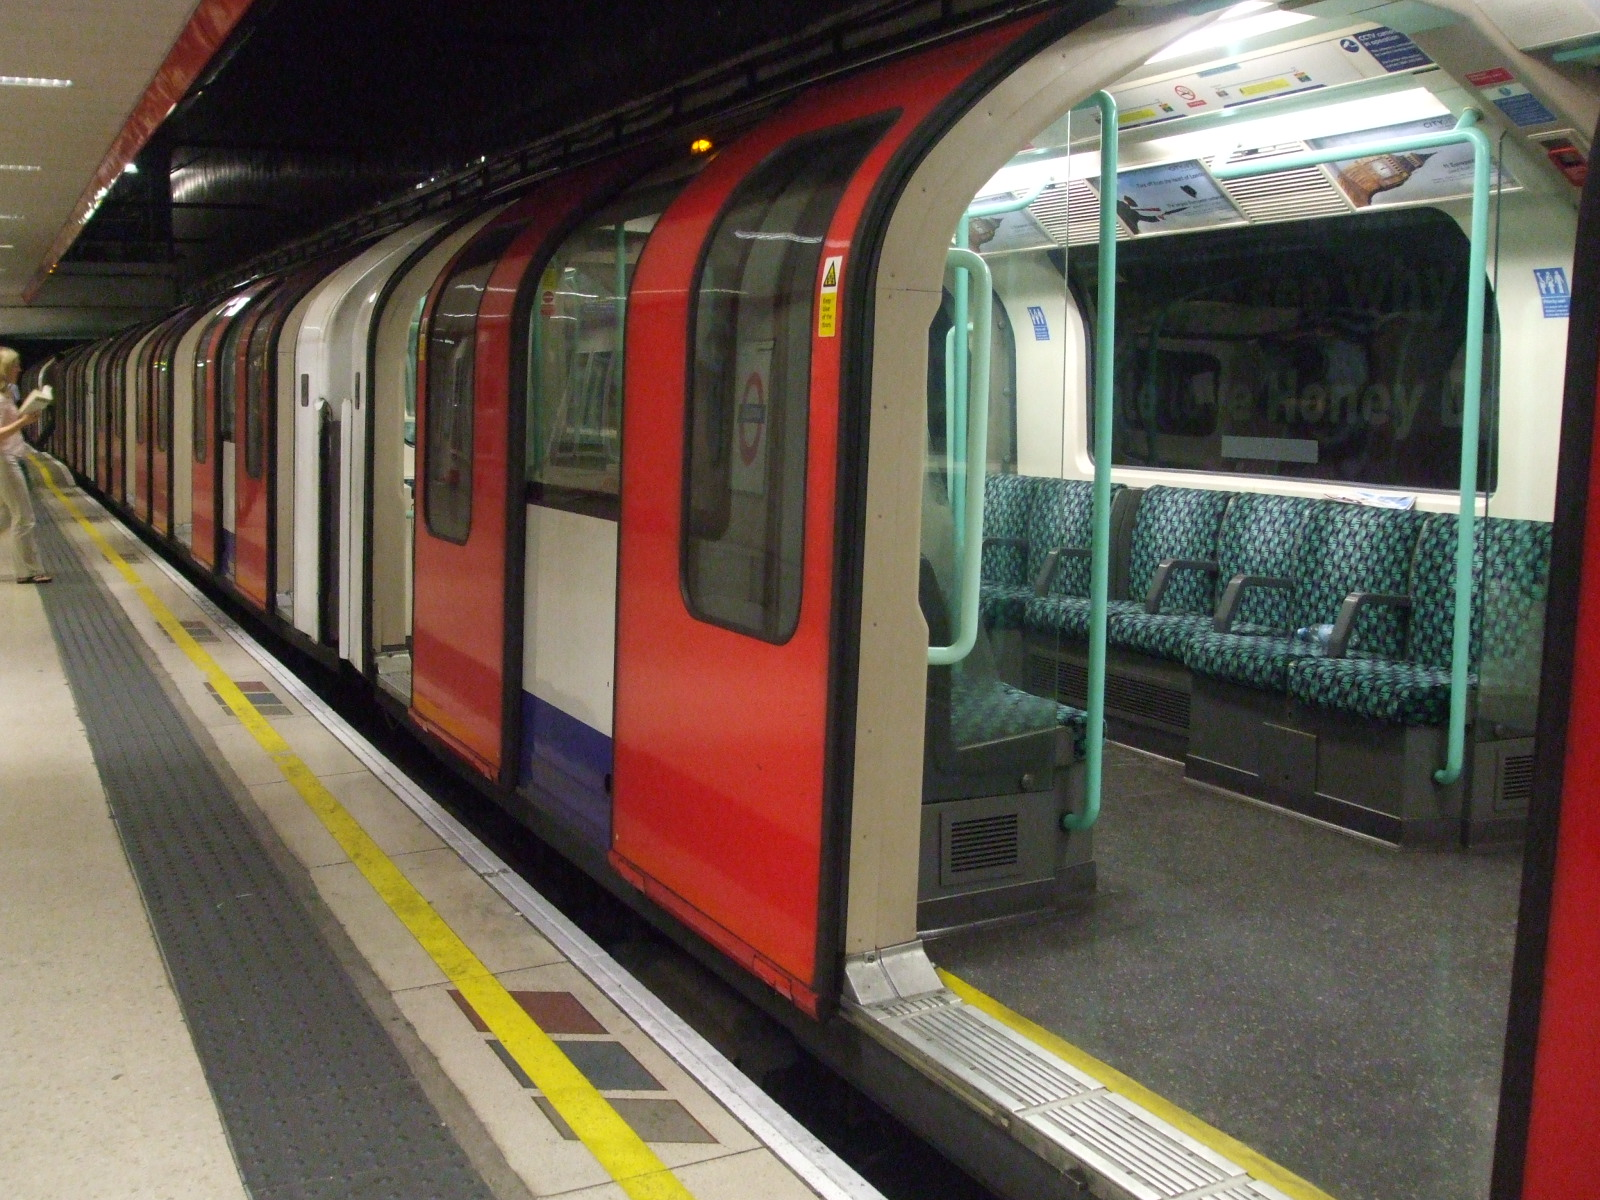 The Vagenda: Groping on the Tube: One Ex-Perverts